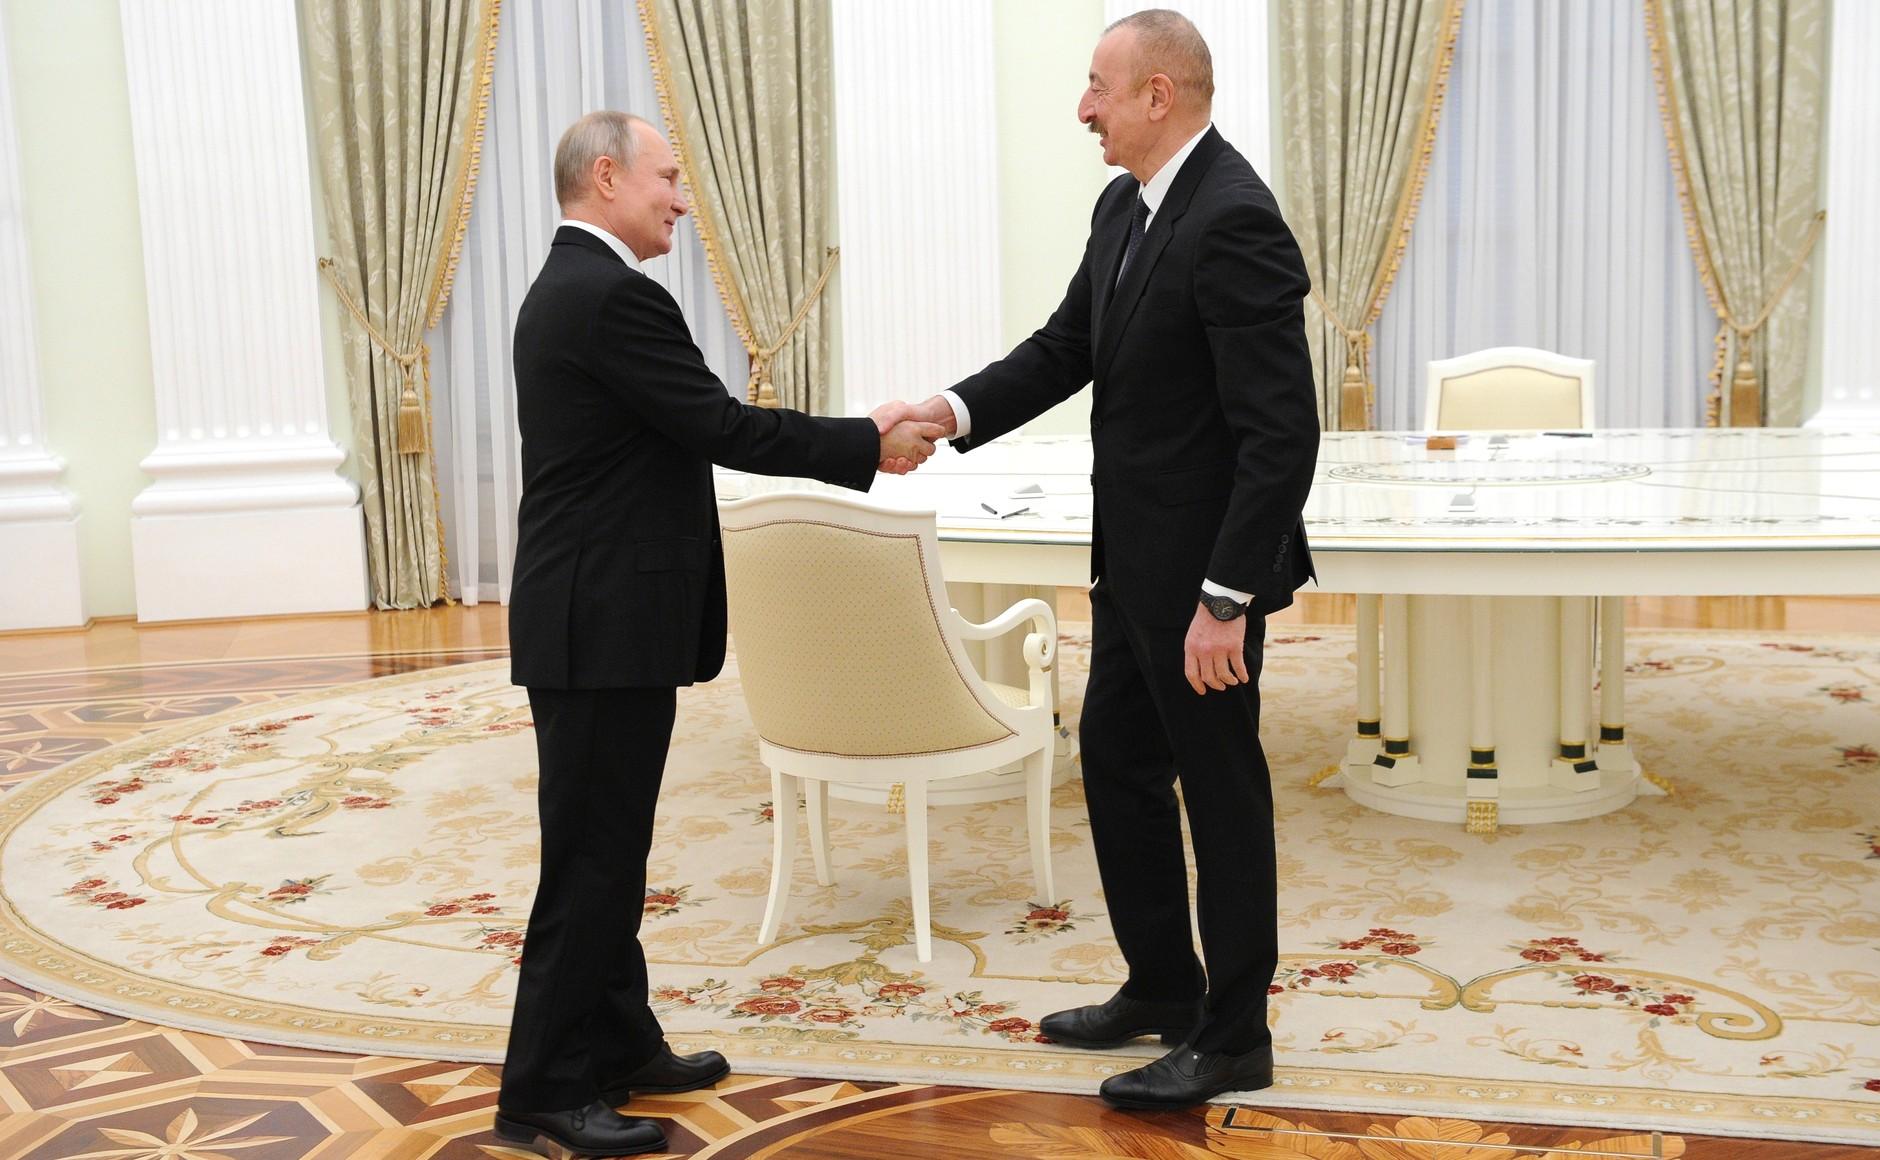 KREMLIN PH 1 XX 3 Rencontre avec Ilham Aliyev et Nikol Pashinyan - 11 janvier 2021 - 17H40